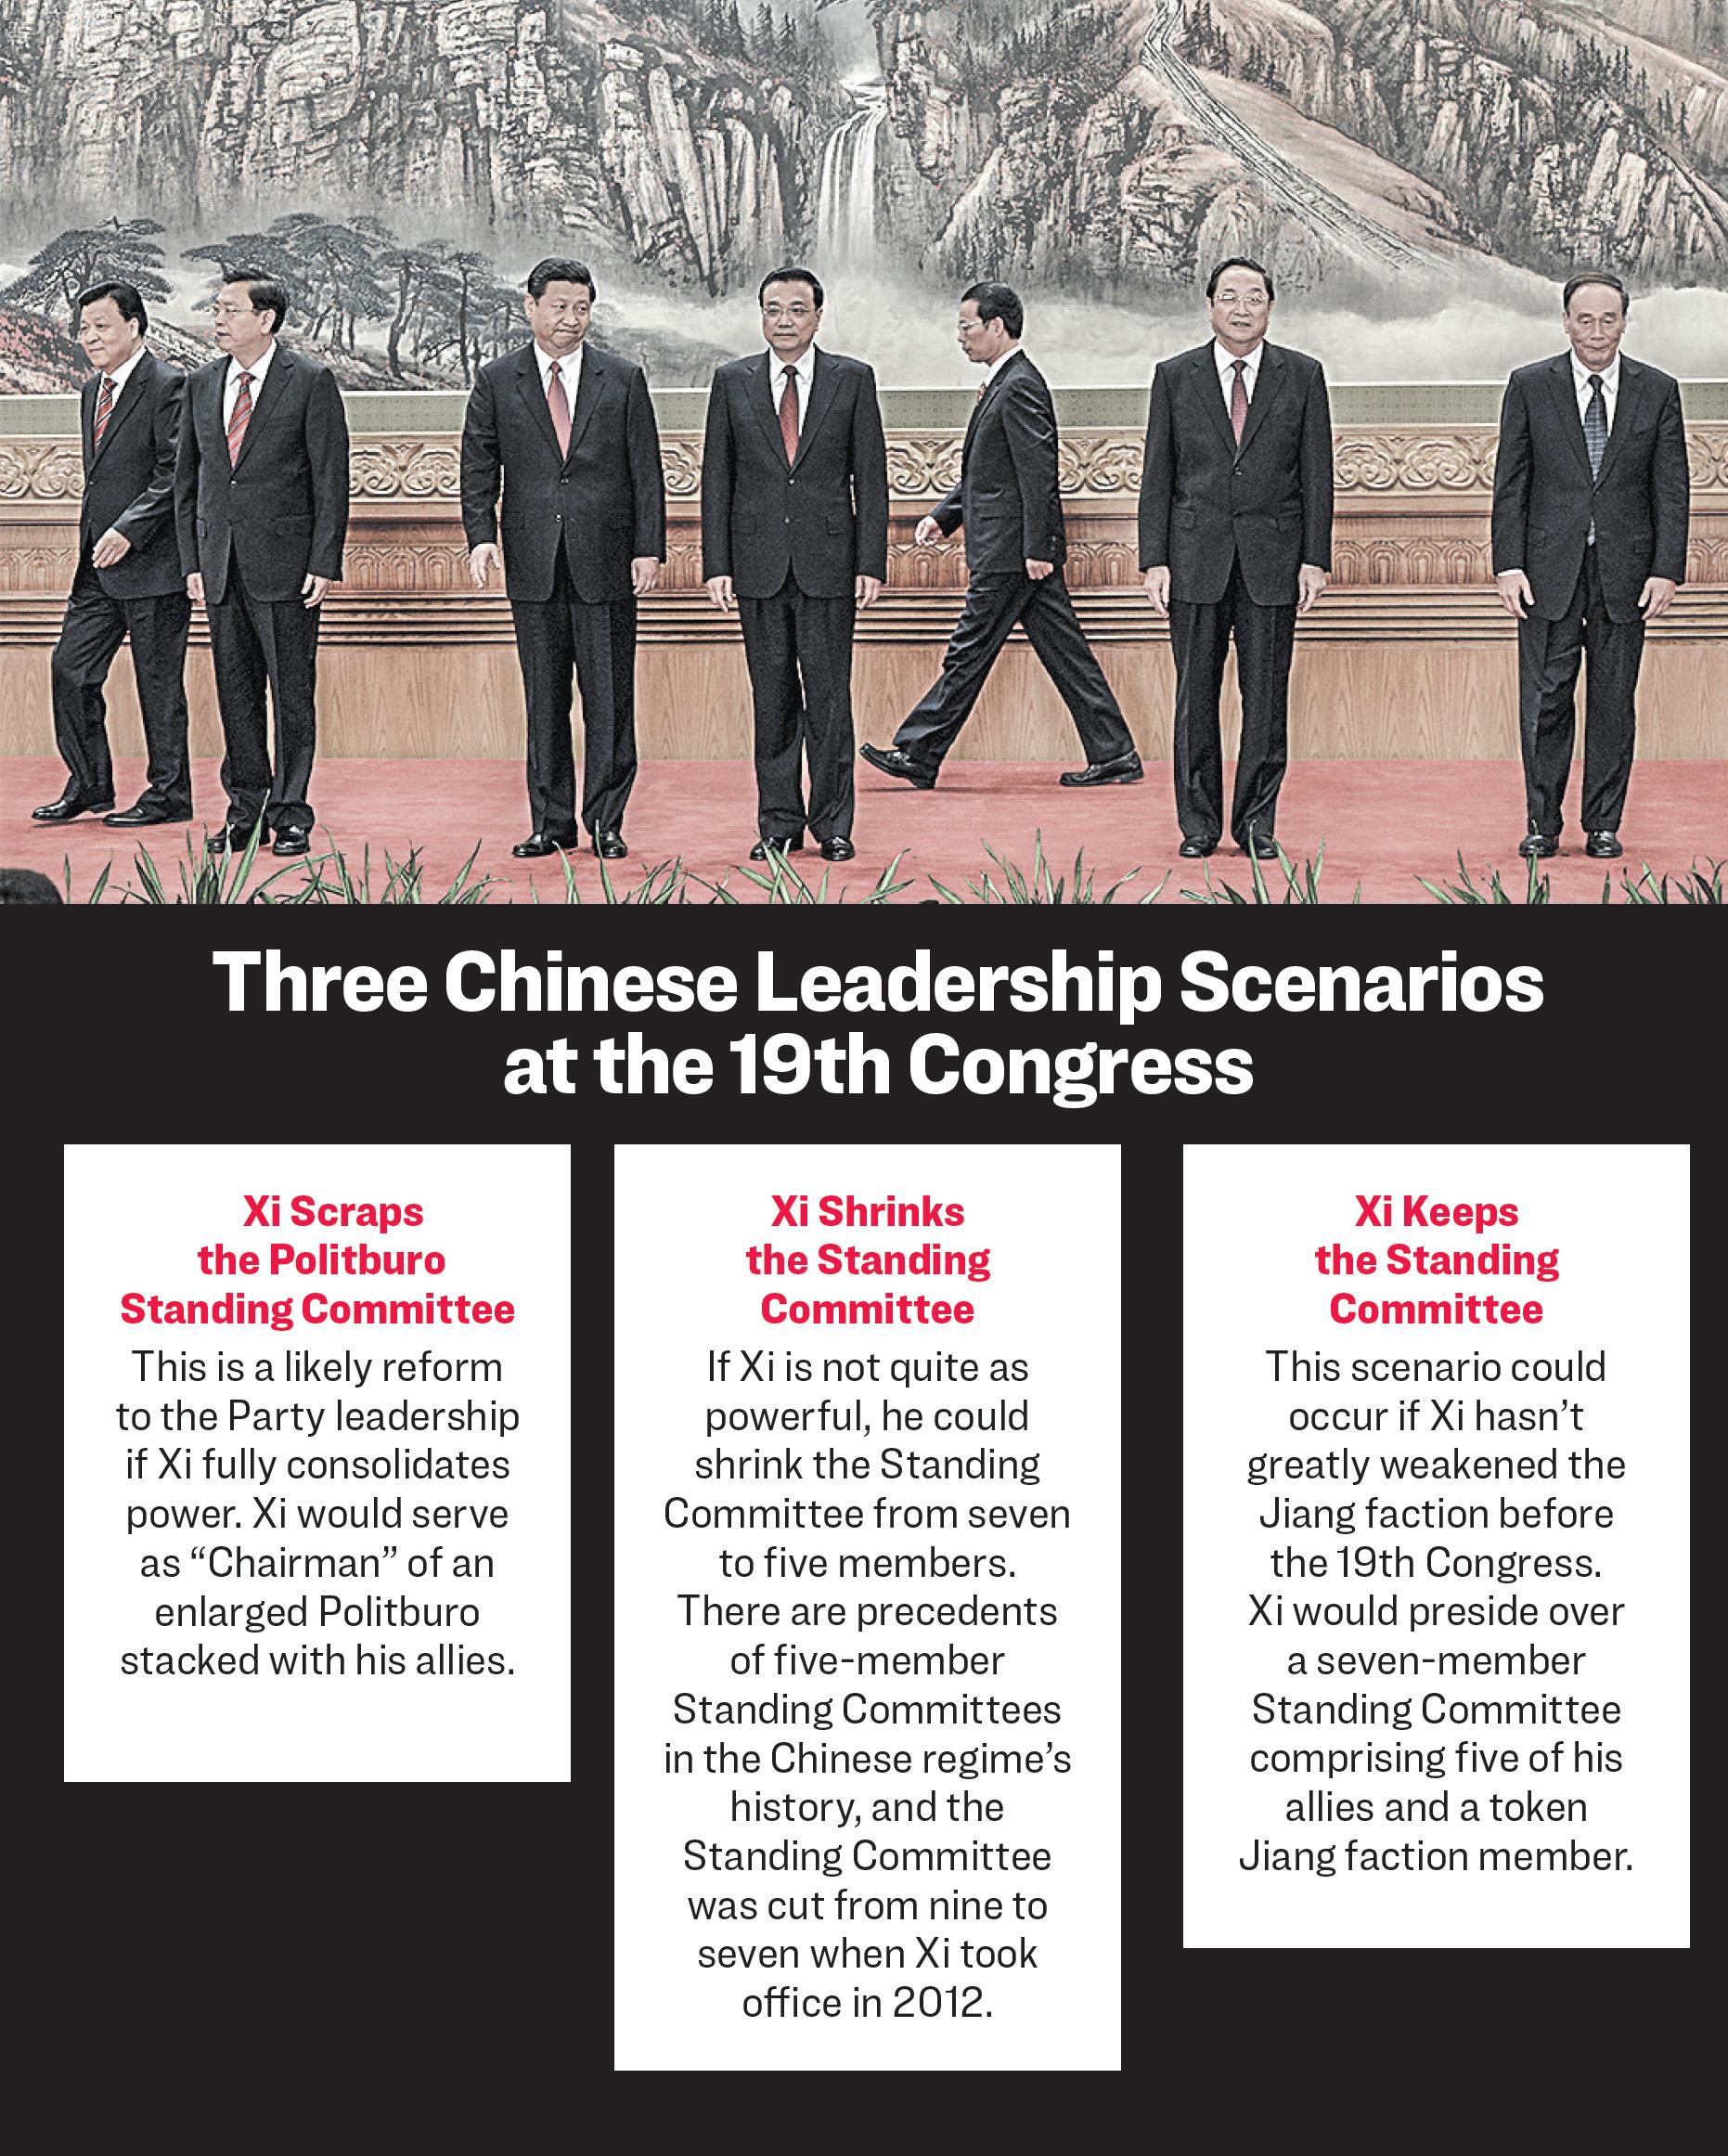 The Communist Party of China's new Politburo Standing Committee, the nation's top decision-making body (L-R) Liu Yunshan, Zhang Dejiang, Xi Jinping, Li Keqiang, Zhang Gaoli, Yu Zhengsheng and Wang Qishan meet the press at the Great Hall of the People in Beijing on Nov. 15, 2012. (MARK RALSTON/AFP/Getty Images)